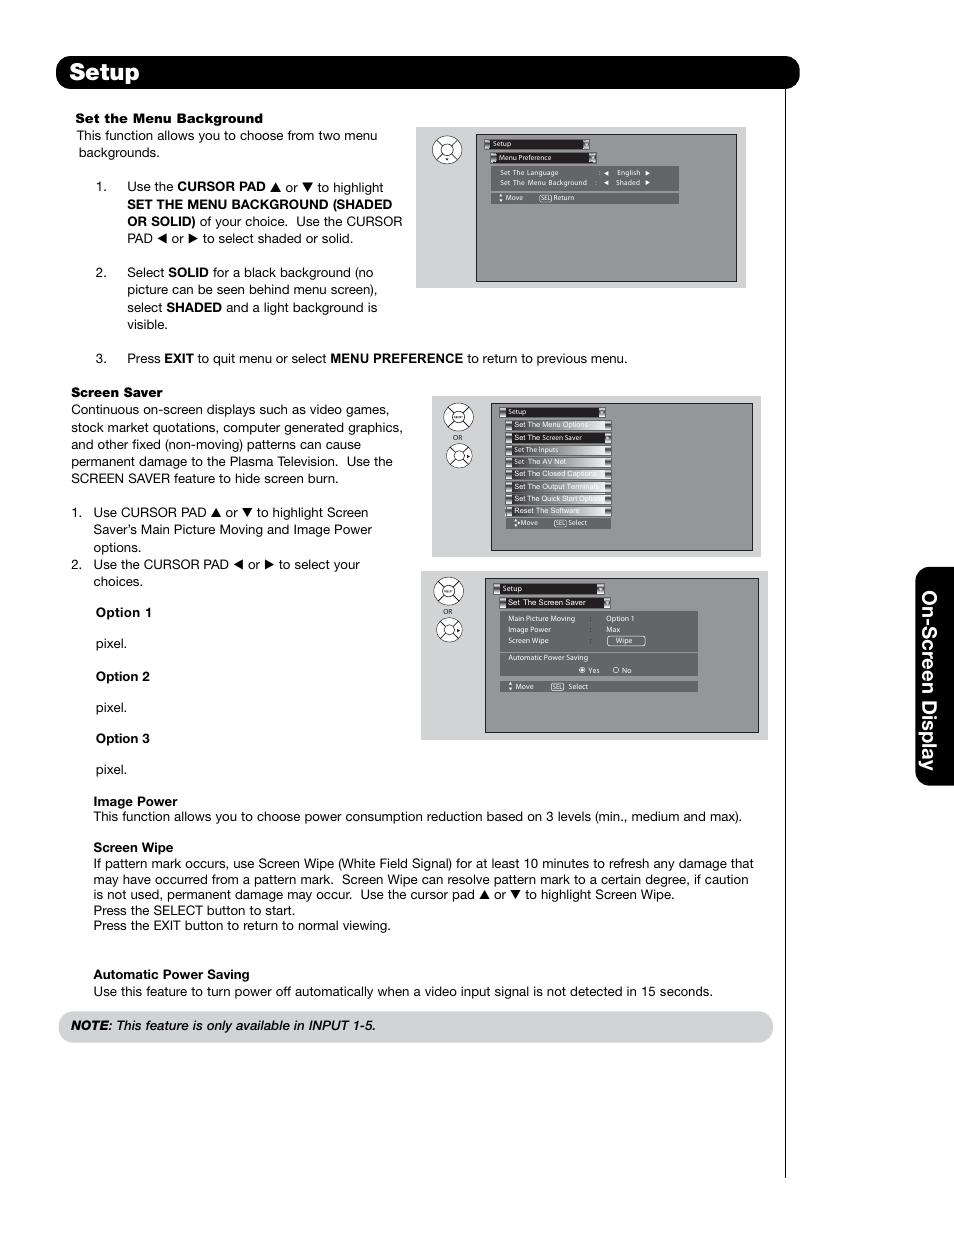 setup on scr een display hitachi 55hdt79 user manual page 67 rh manualsdir com Hitachi 42HDS69 Remote Hitachi Plasma Repair Manual